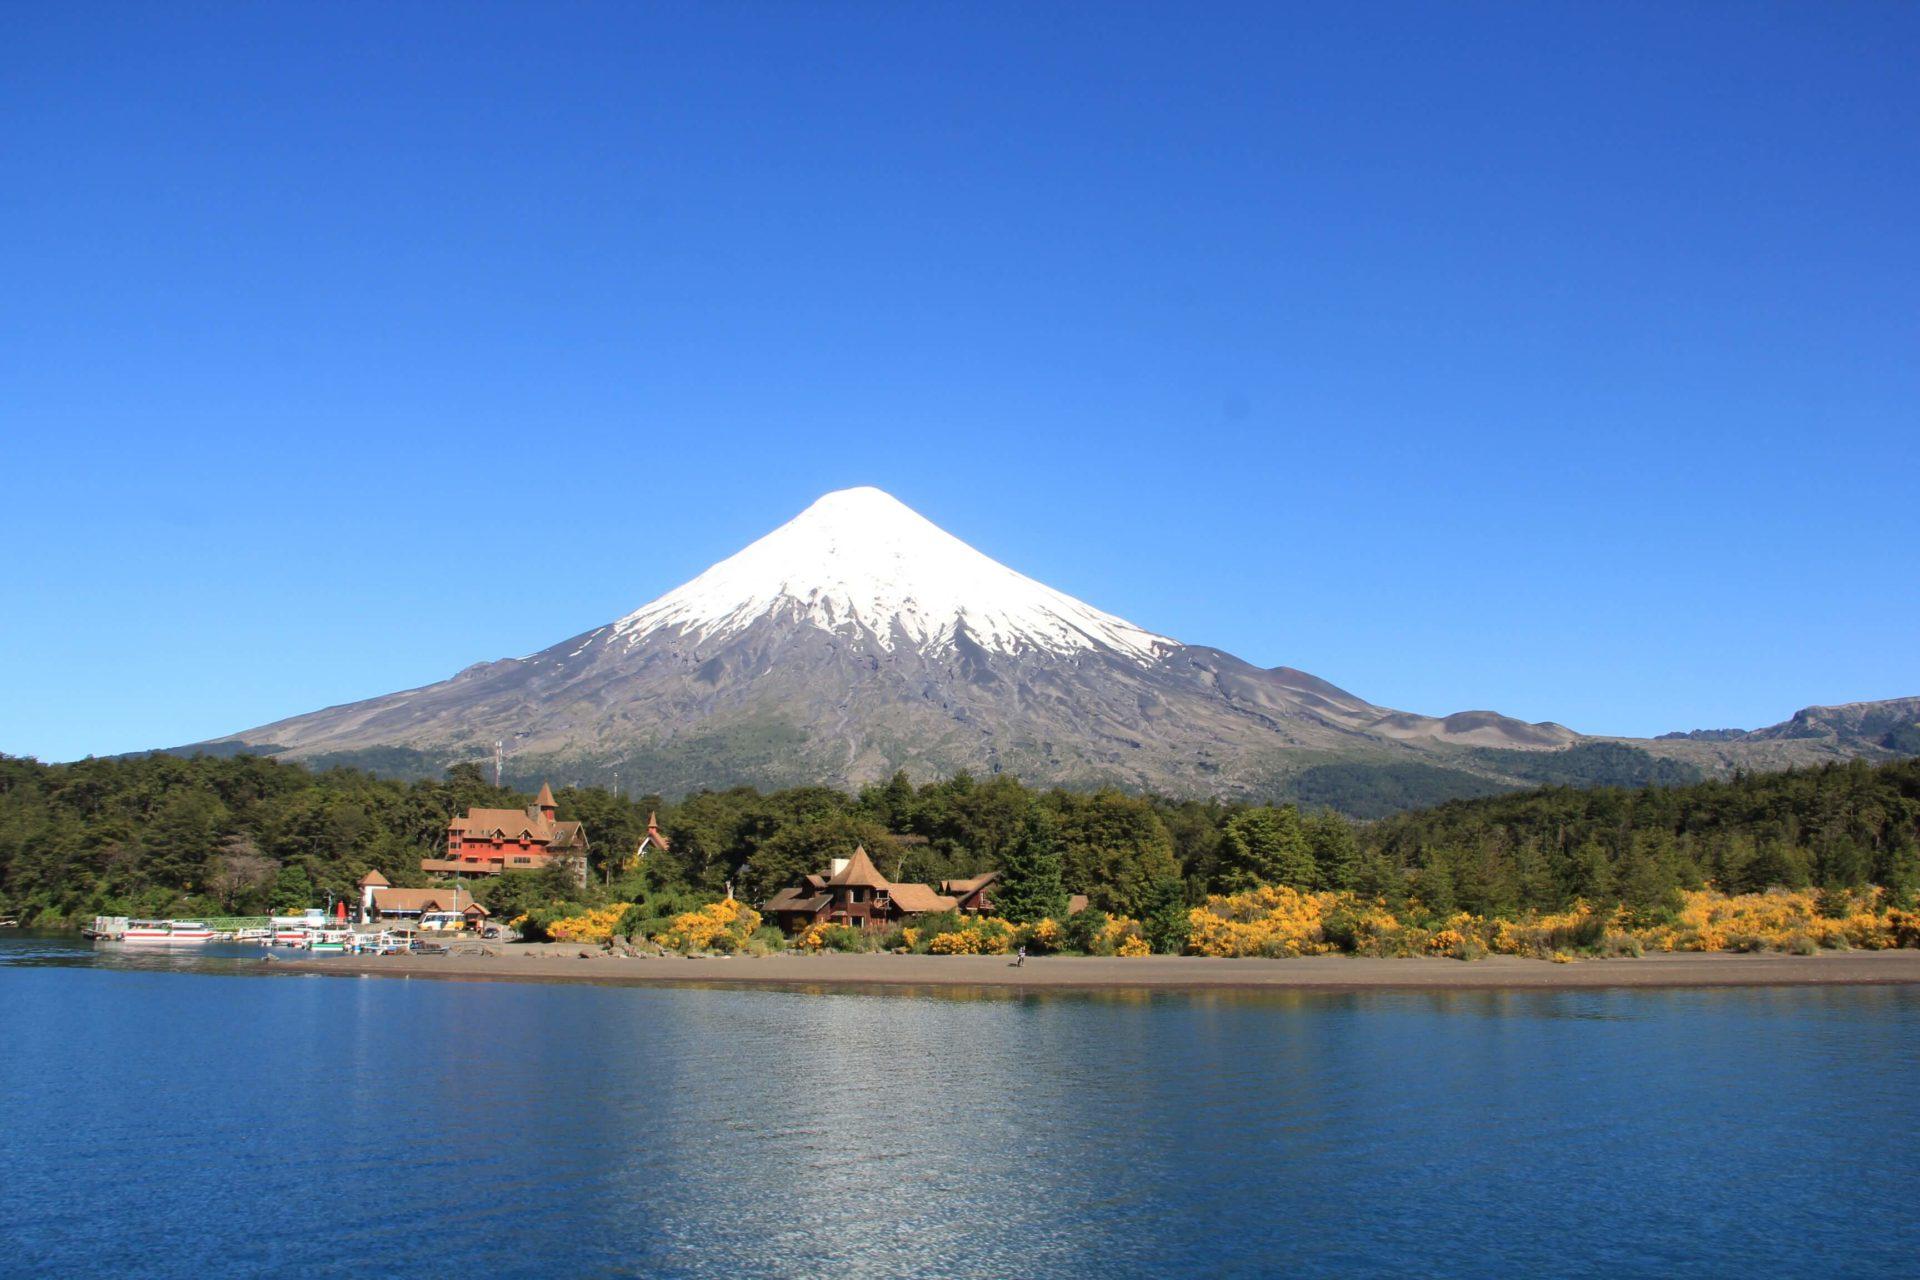 Vulkan Osorno in Puerto Montt - Nordpatagonien